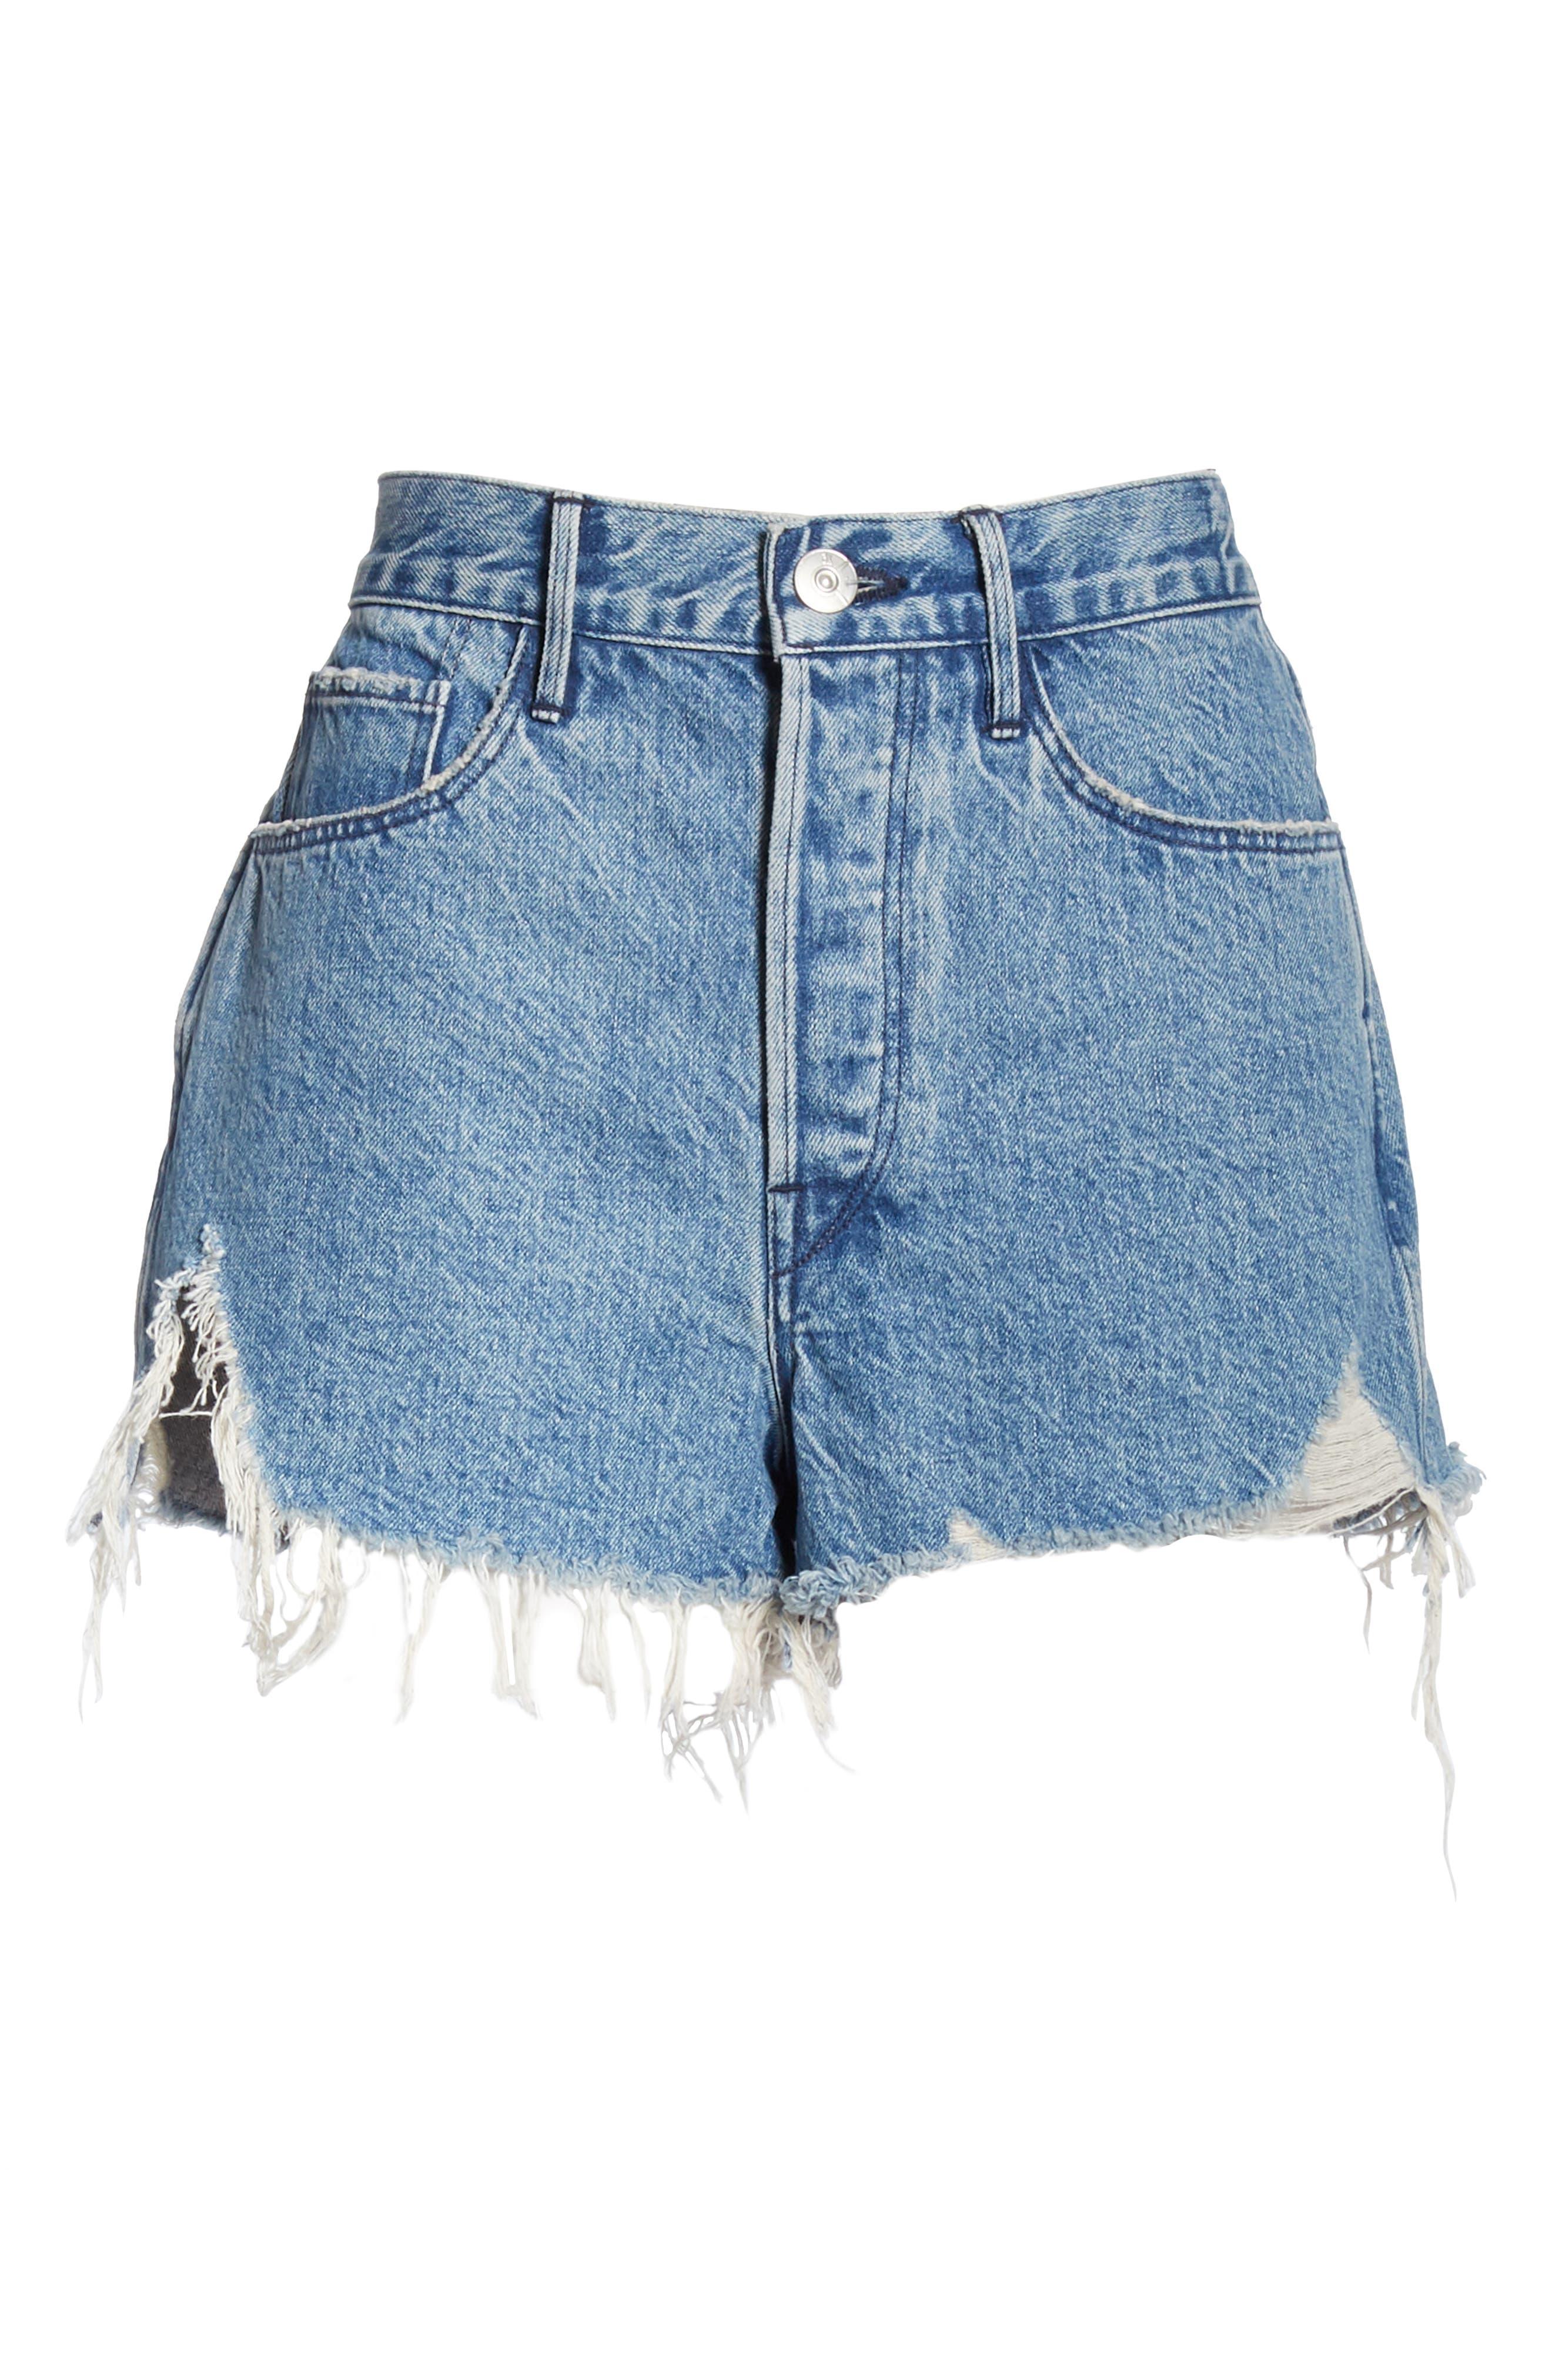 W4 Carter Ripped High Waist Denim Shorts,                             Alternate thumbnail 6, color,                             421